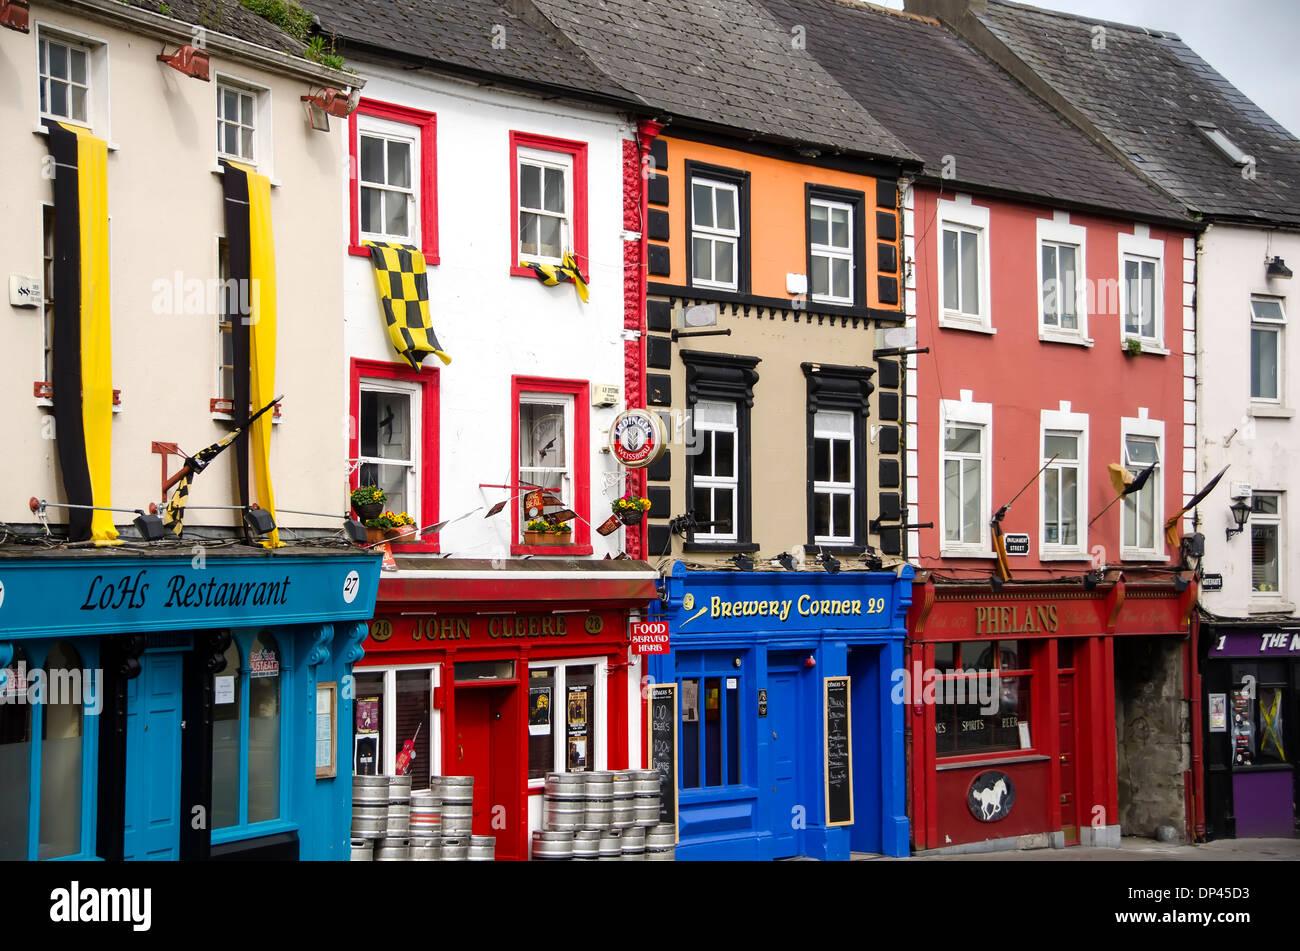 Straßenbild, farbenfrohe Architektur Gebäude Parliament Street, Kilkenny Stadtzentrum, Irland Stockbild